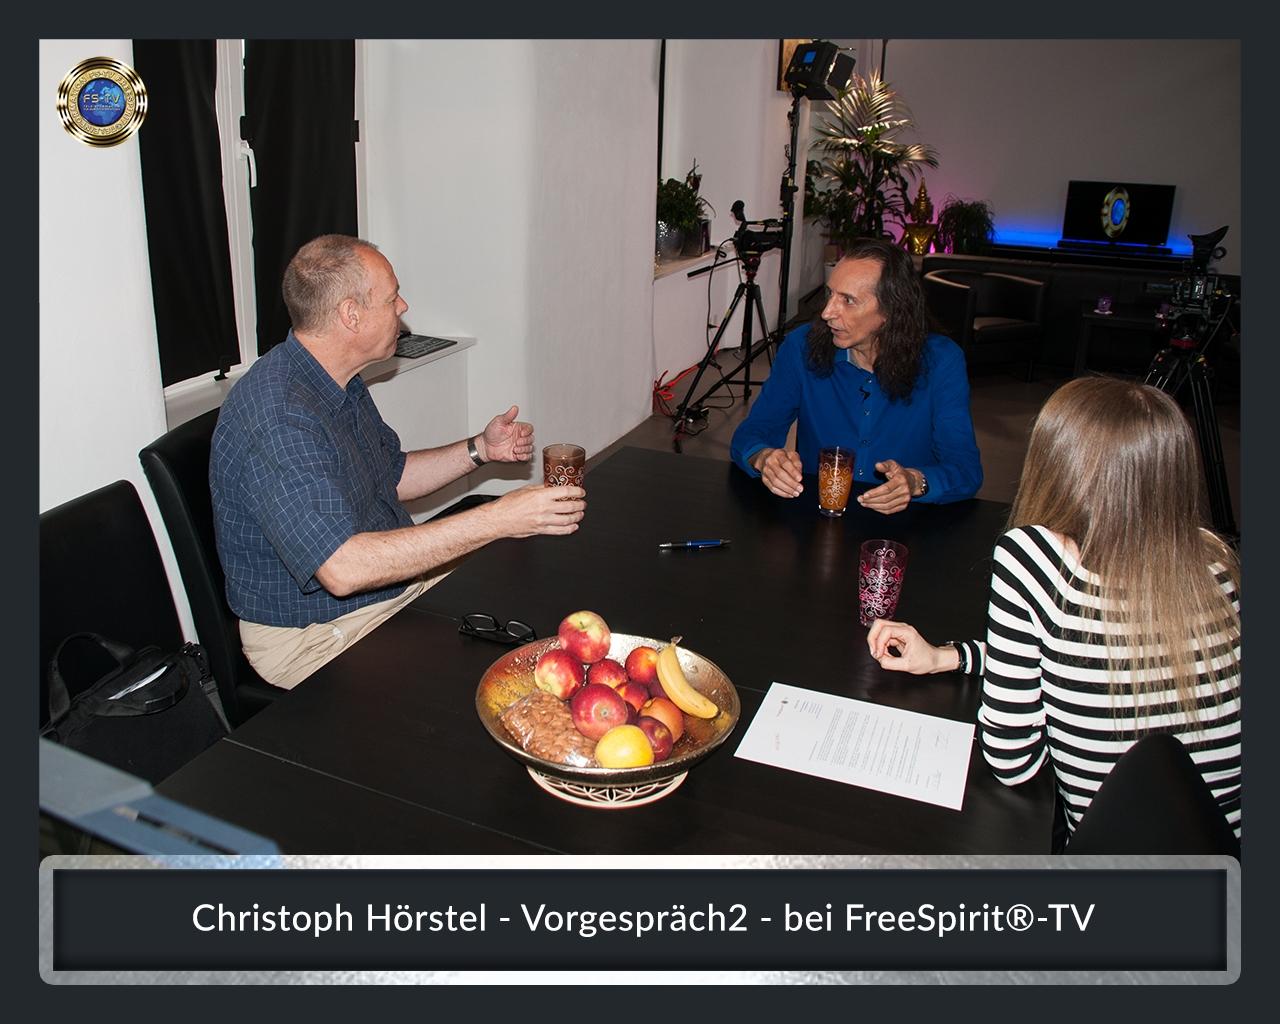 FS-TV-Bildergallerie-Hörstel 2